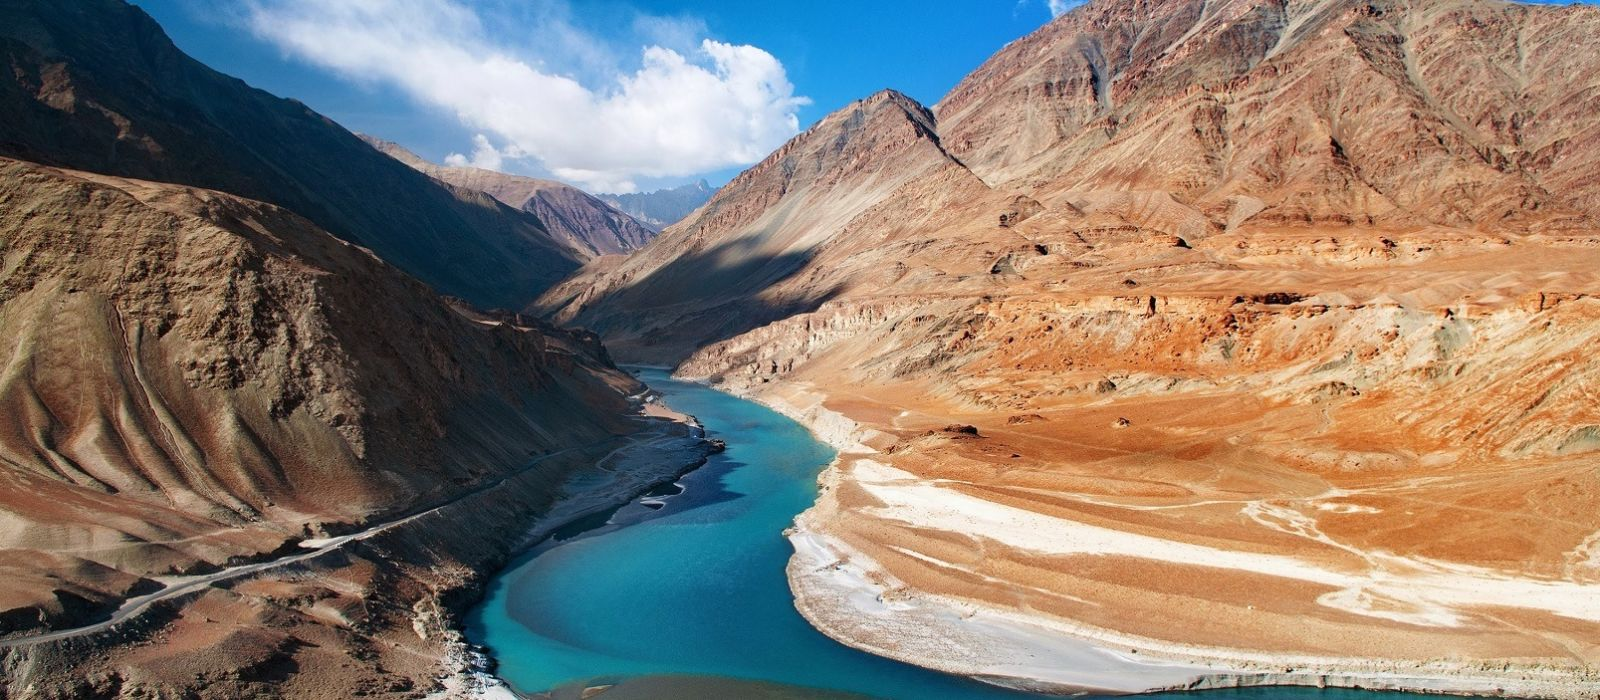 Luxurious North India & The Himalayas Tour Trip 2